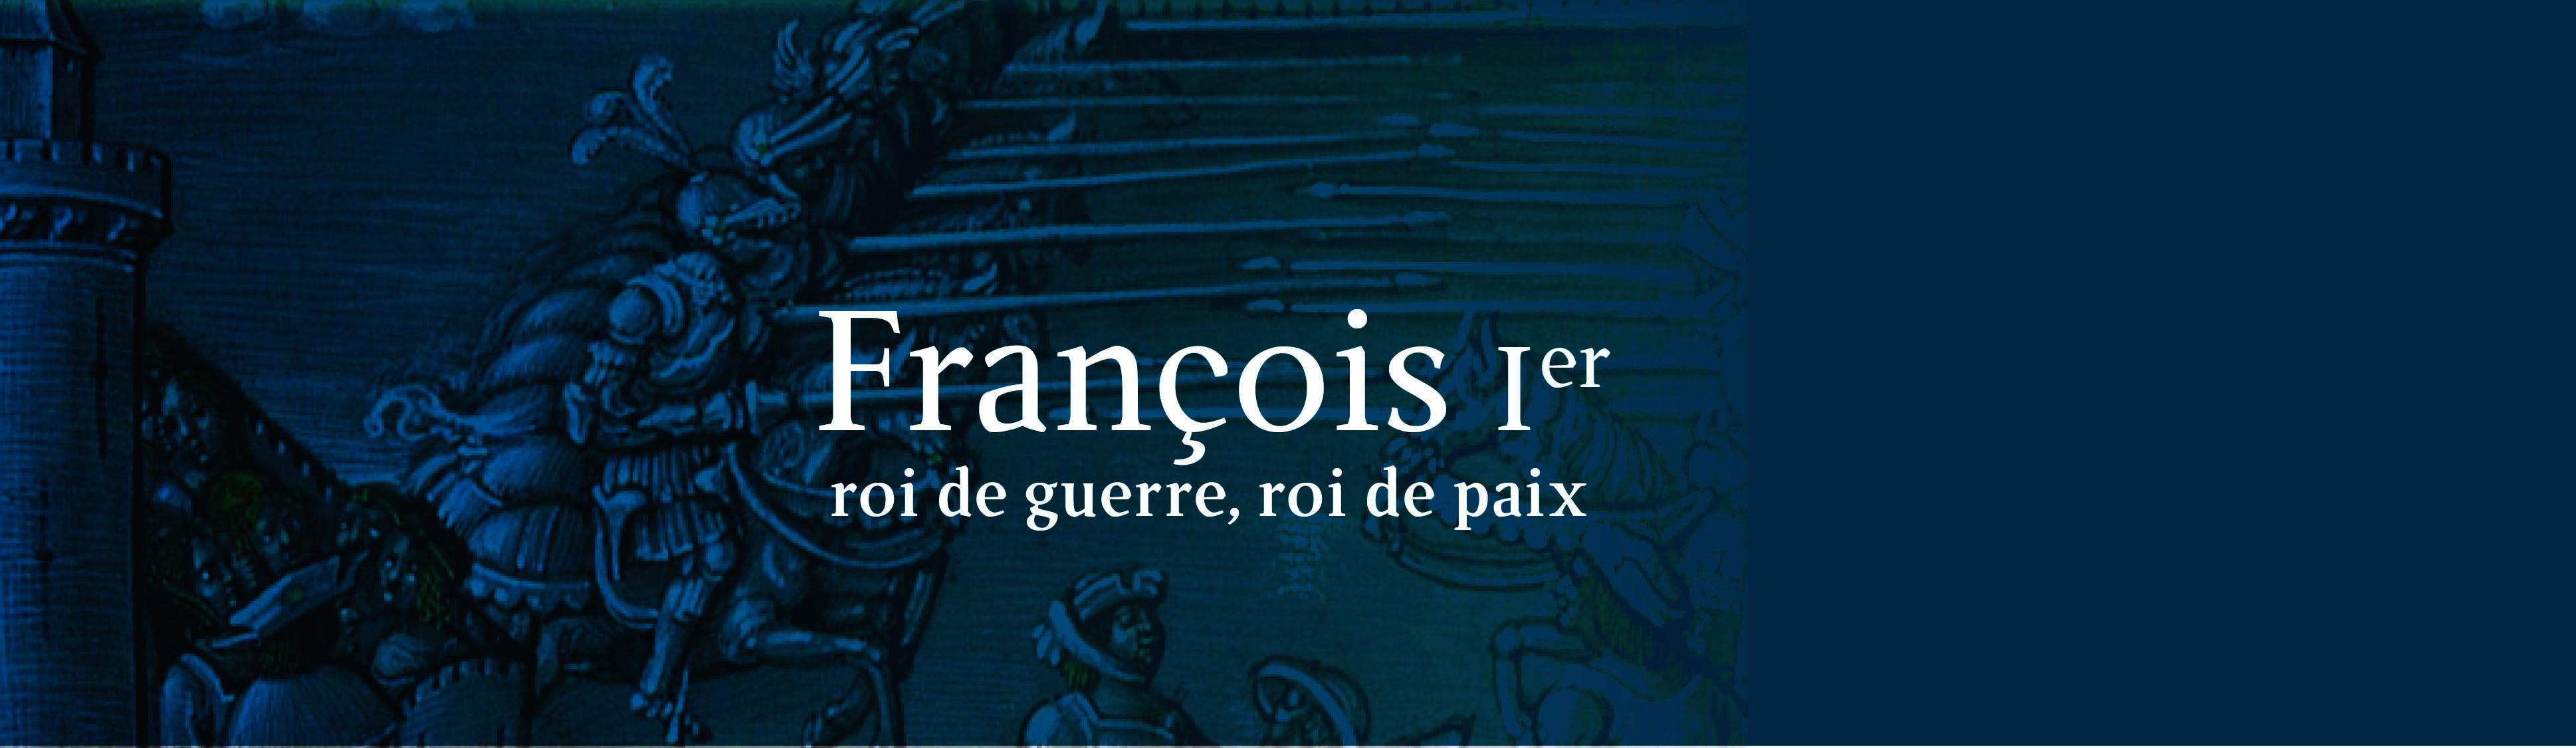 FRANCOIS1ER-1